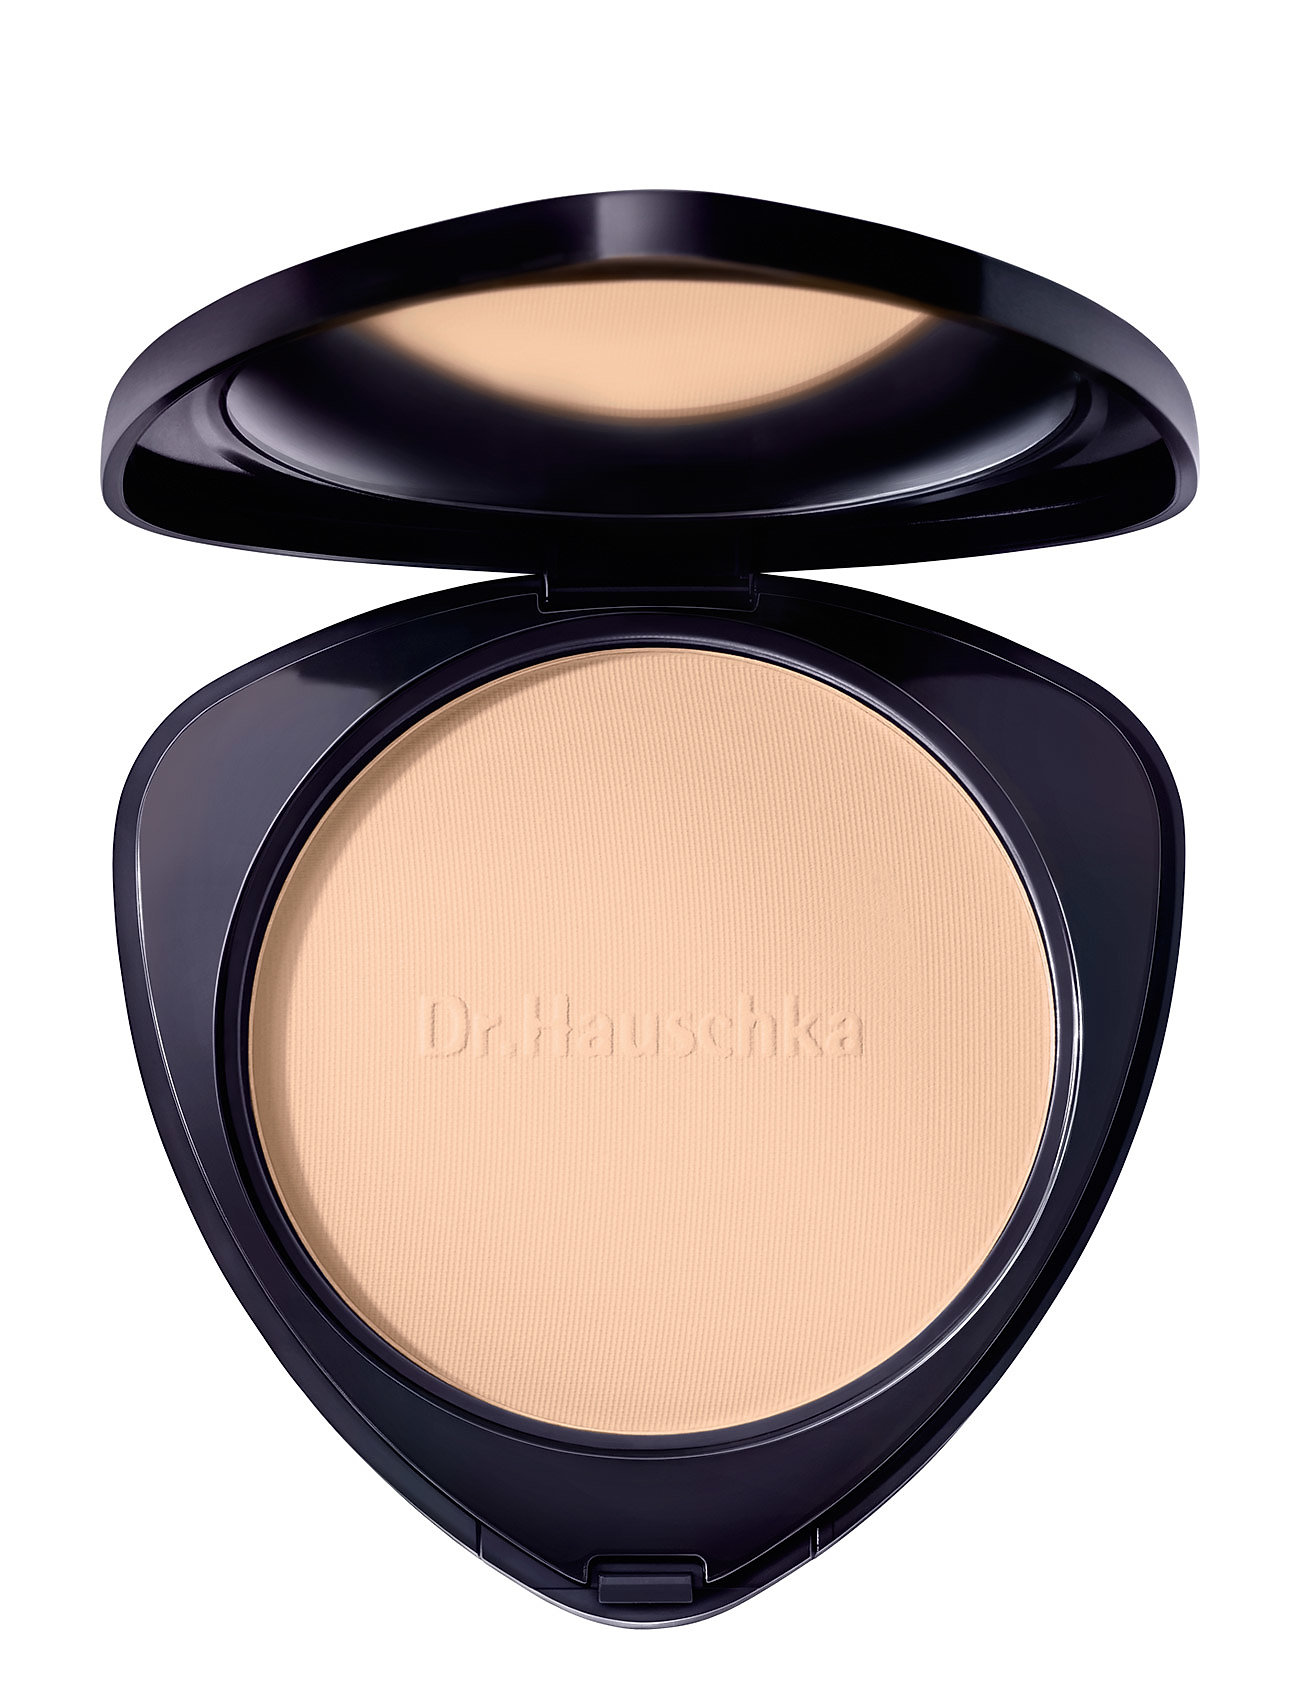 Image of Compact Powder 02 Chestnut Pudder Makeup Dr. Hauschka (3486775125)